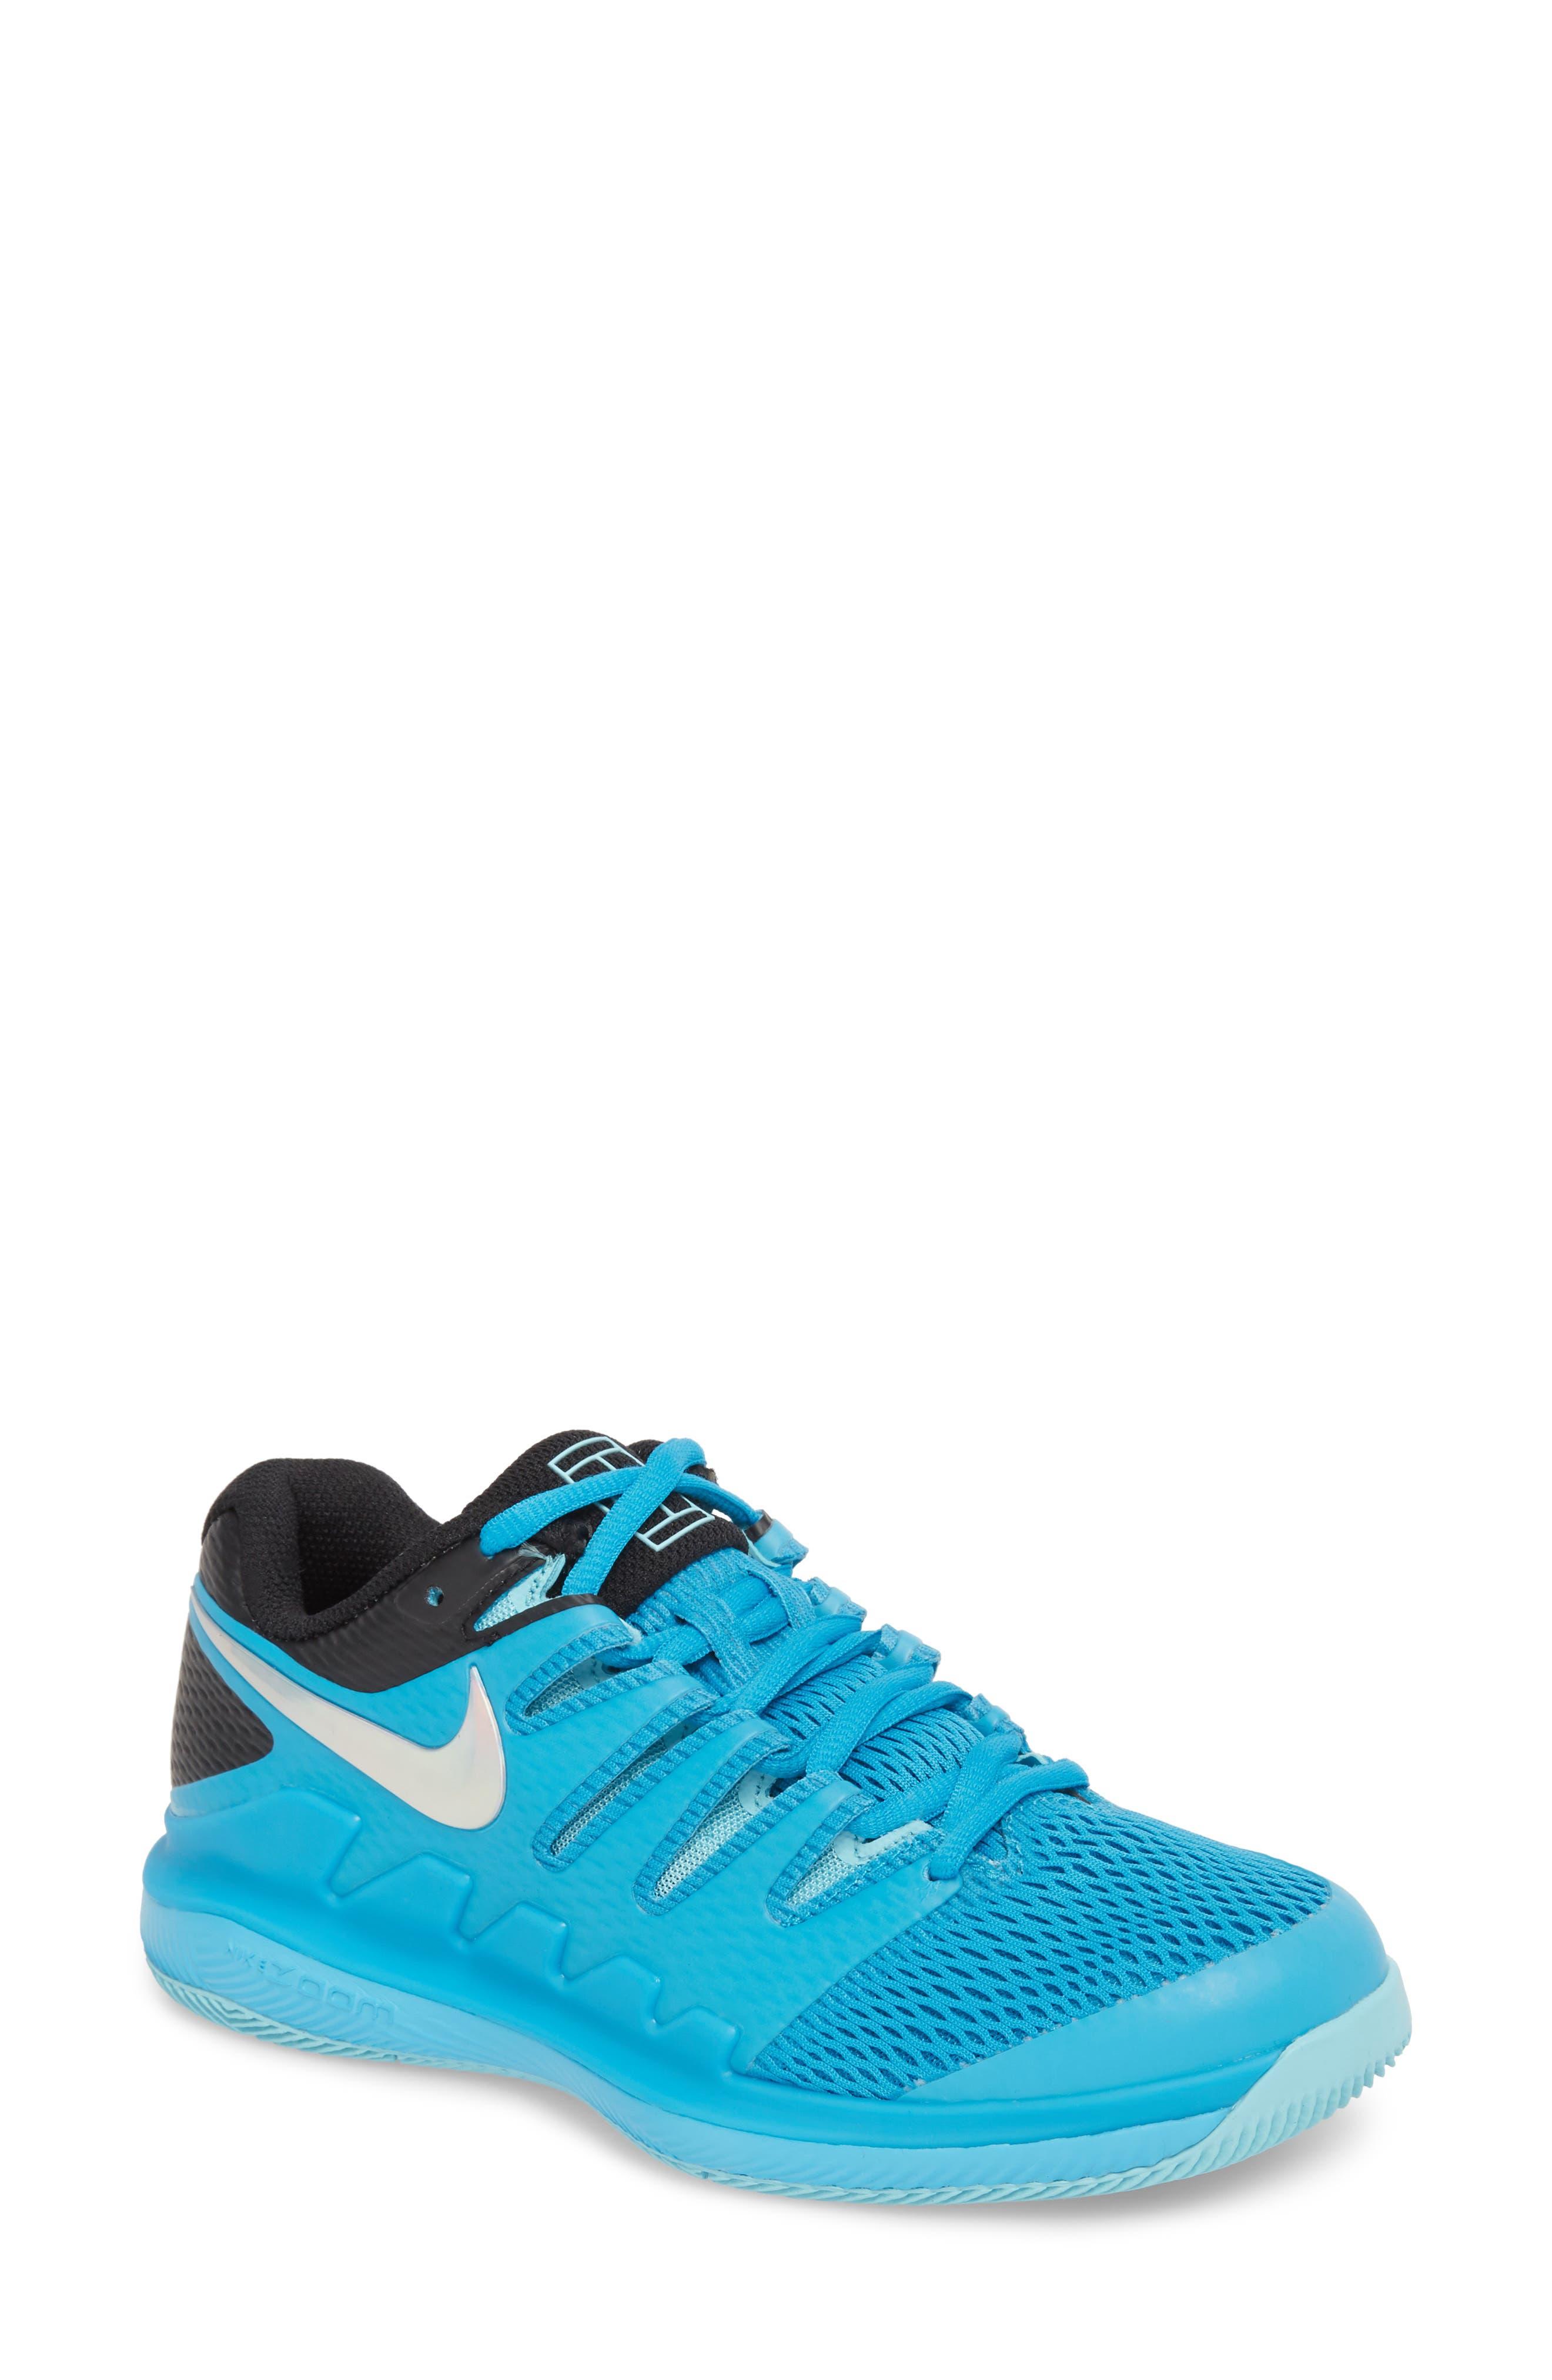 Air Zoom Vapor X Tennis Shoe,                             Main thumbnail 1, color,                             Light Blue Fury